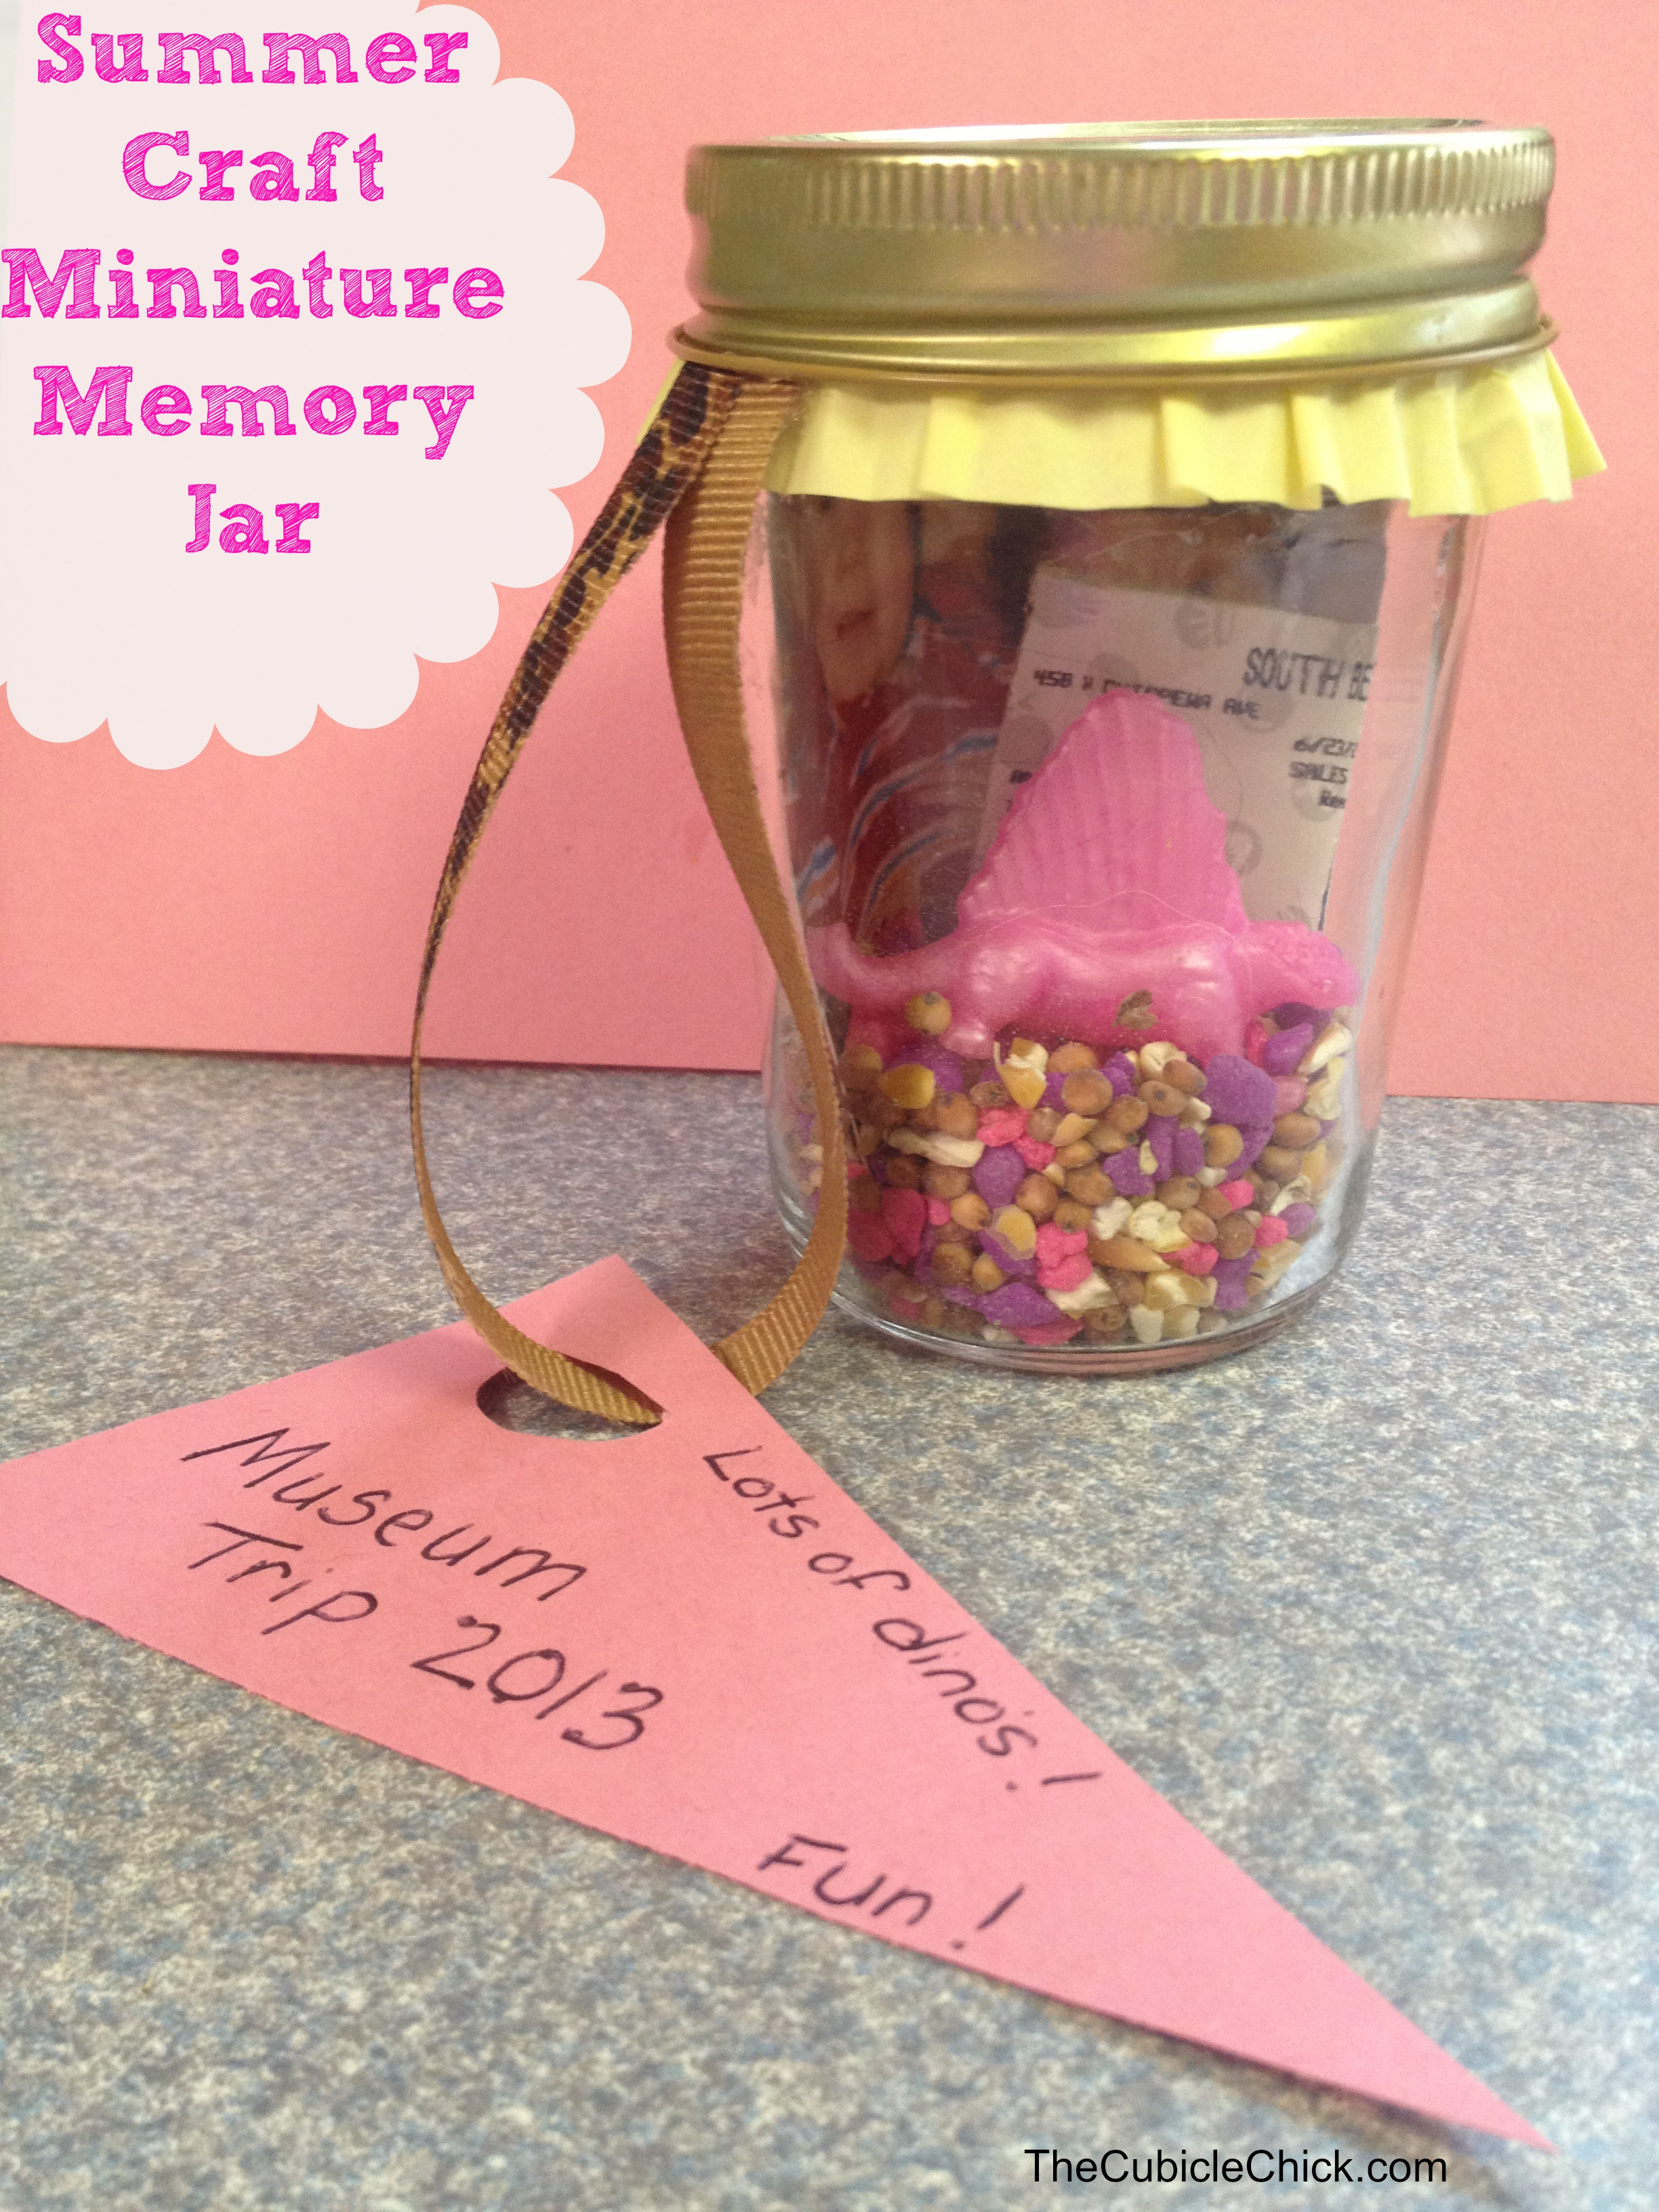 Summer Craft Miniature Memory Jar